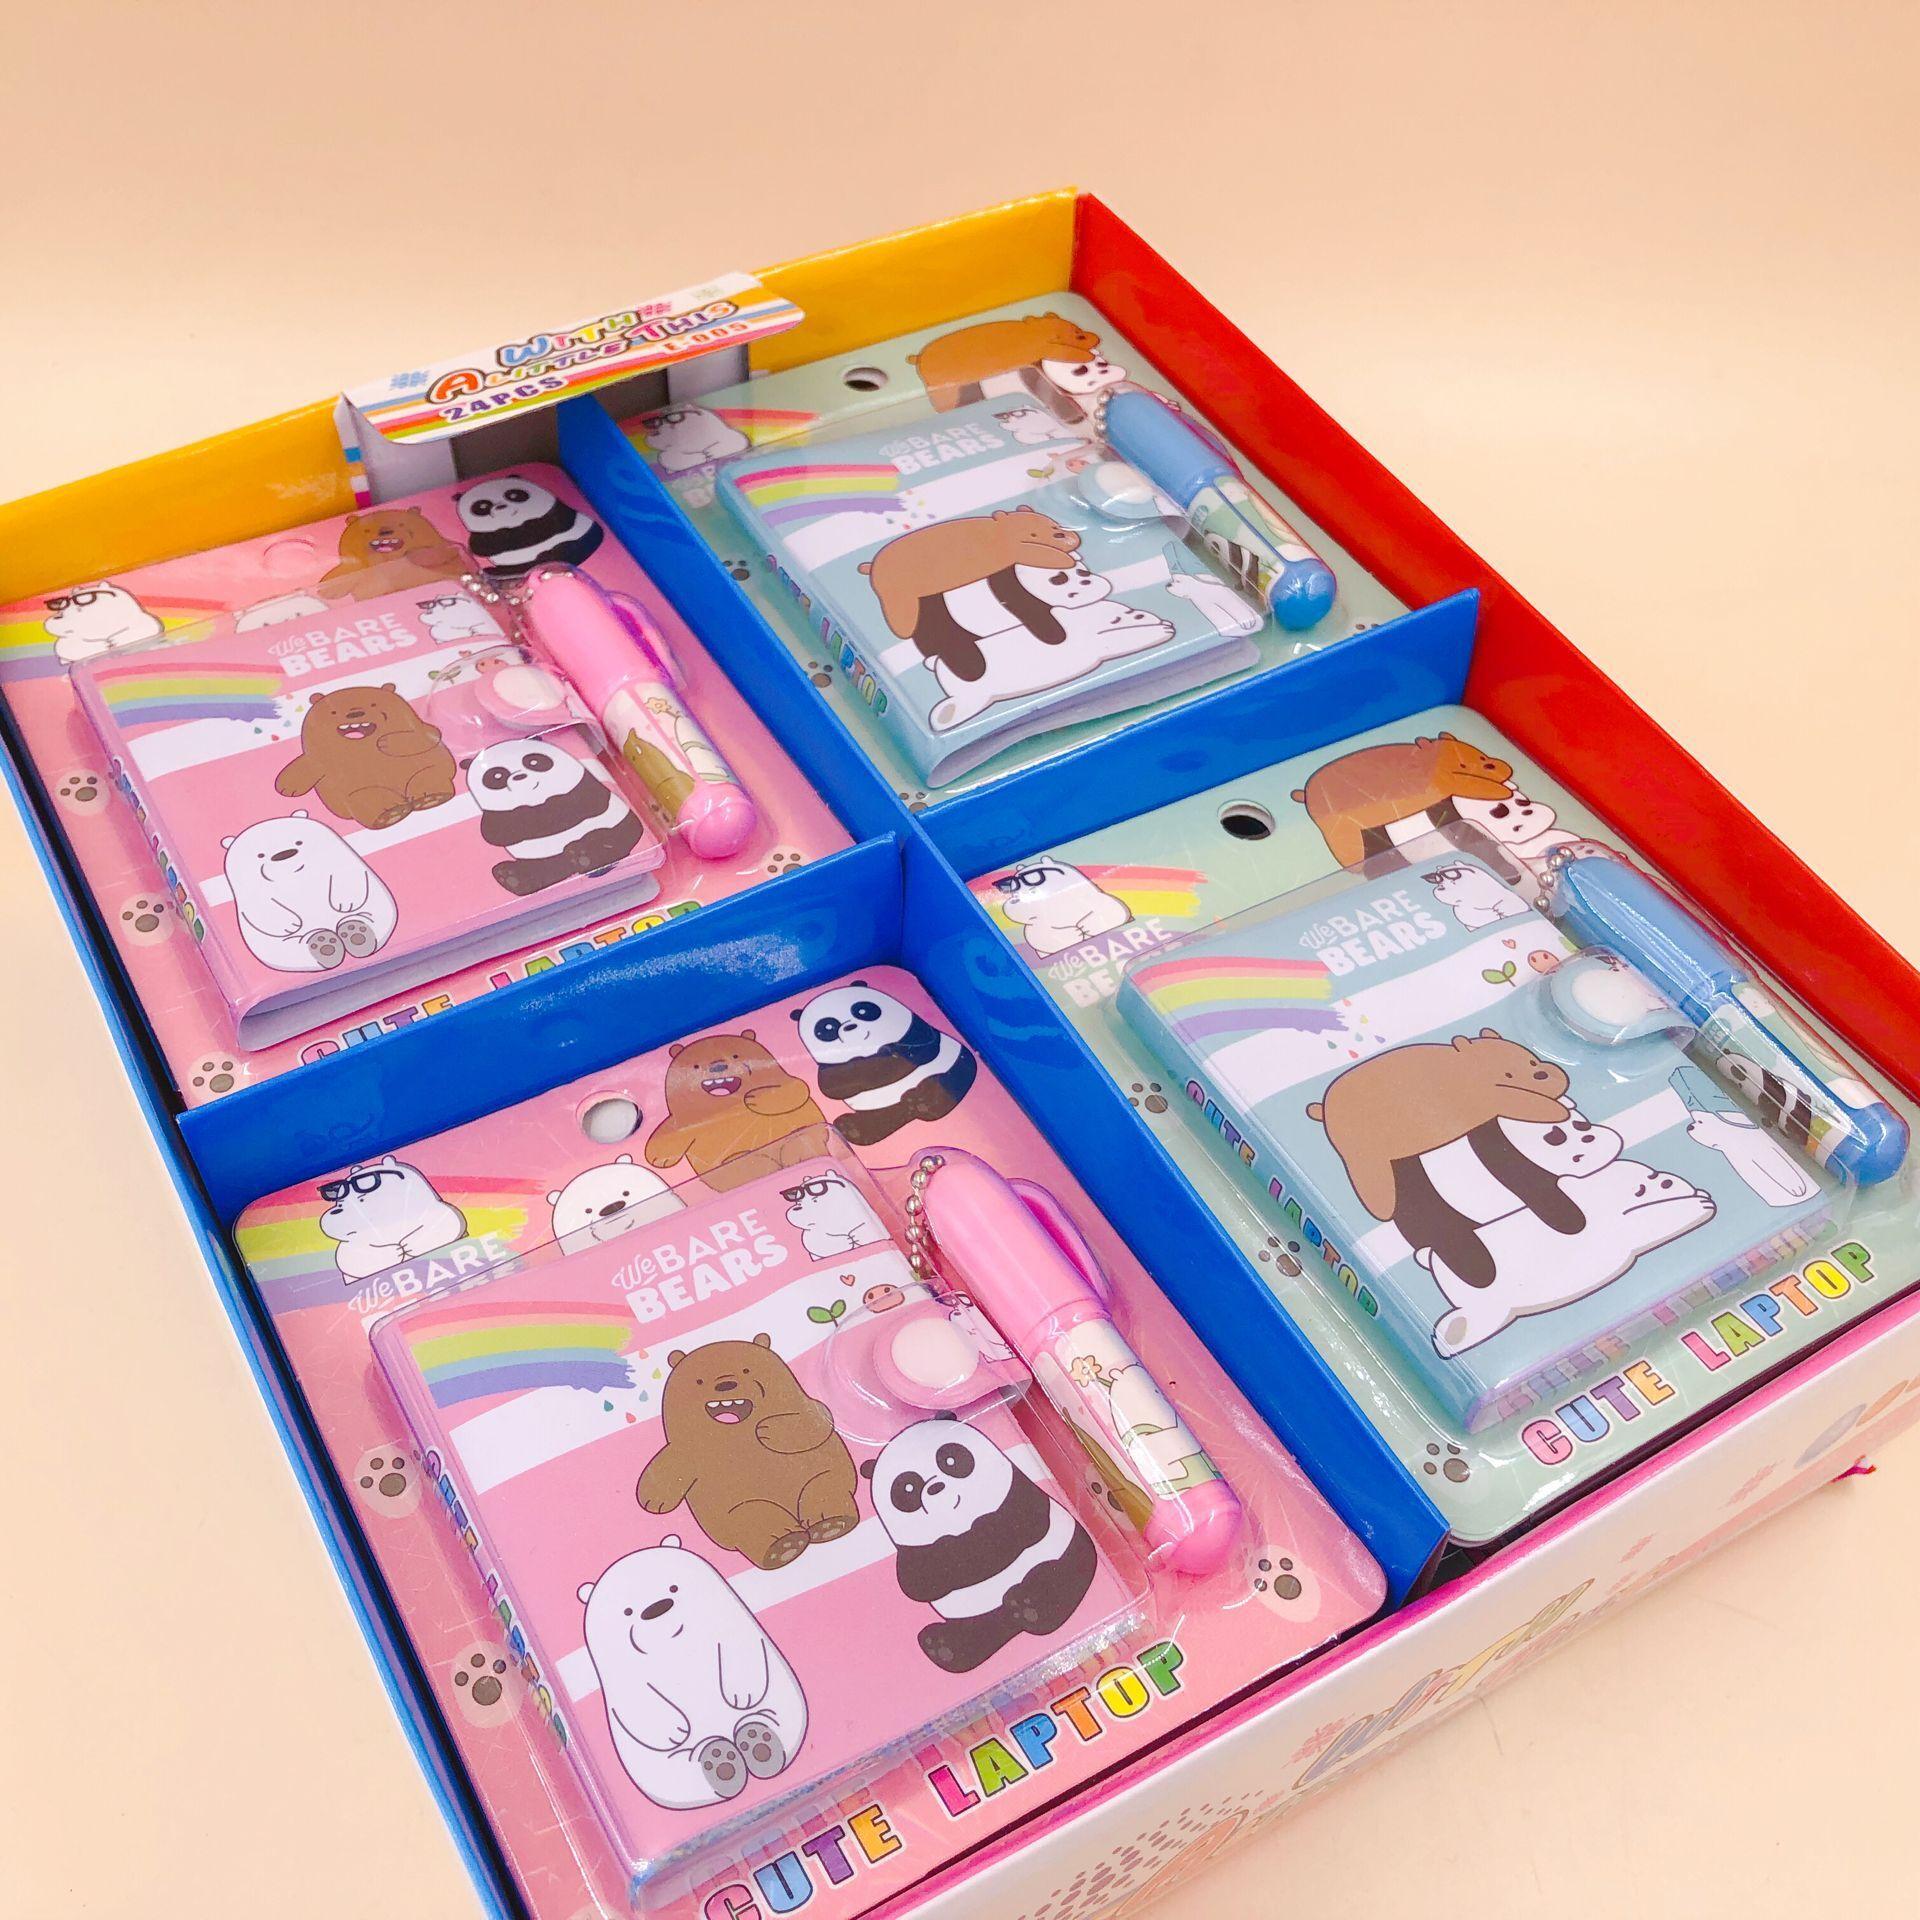 Kawaii Bare Bear Cartoon With Ballpoint Pen Mini Book Set Portable Pocket Notebook Diary Notepad Escolar Papelaria